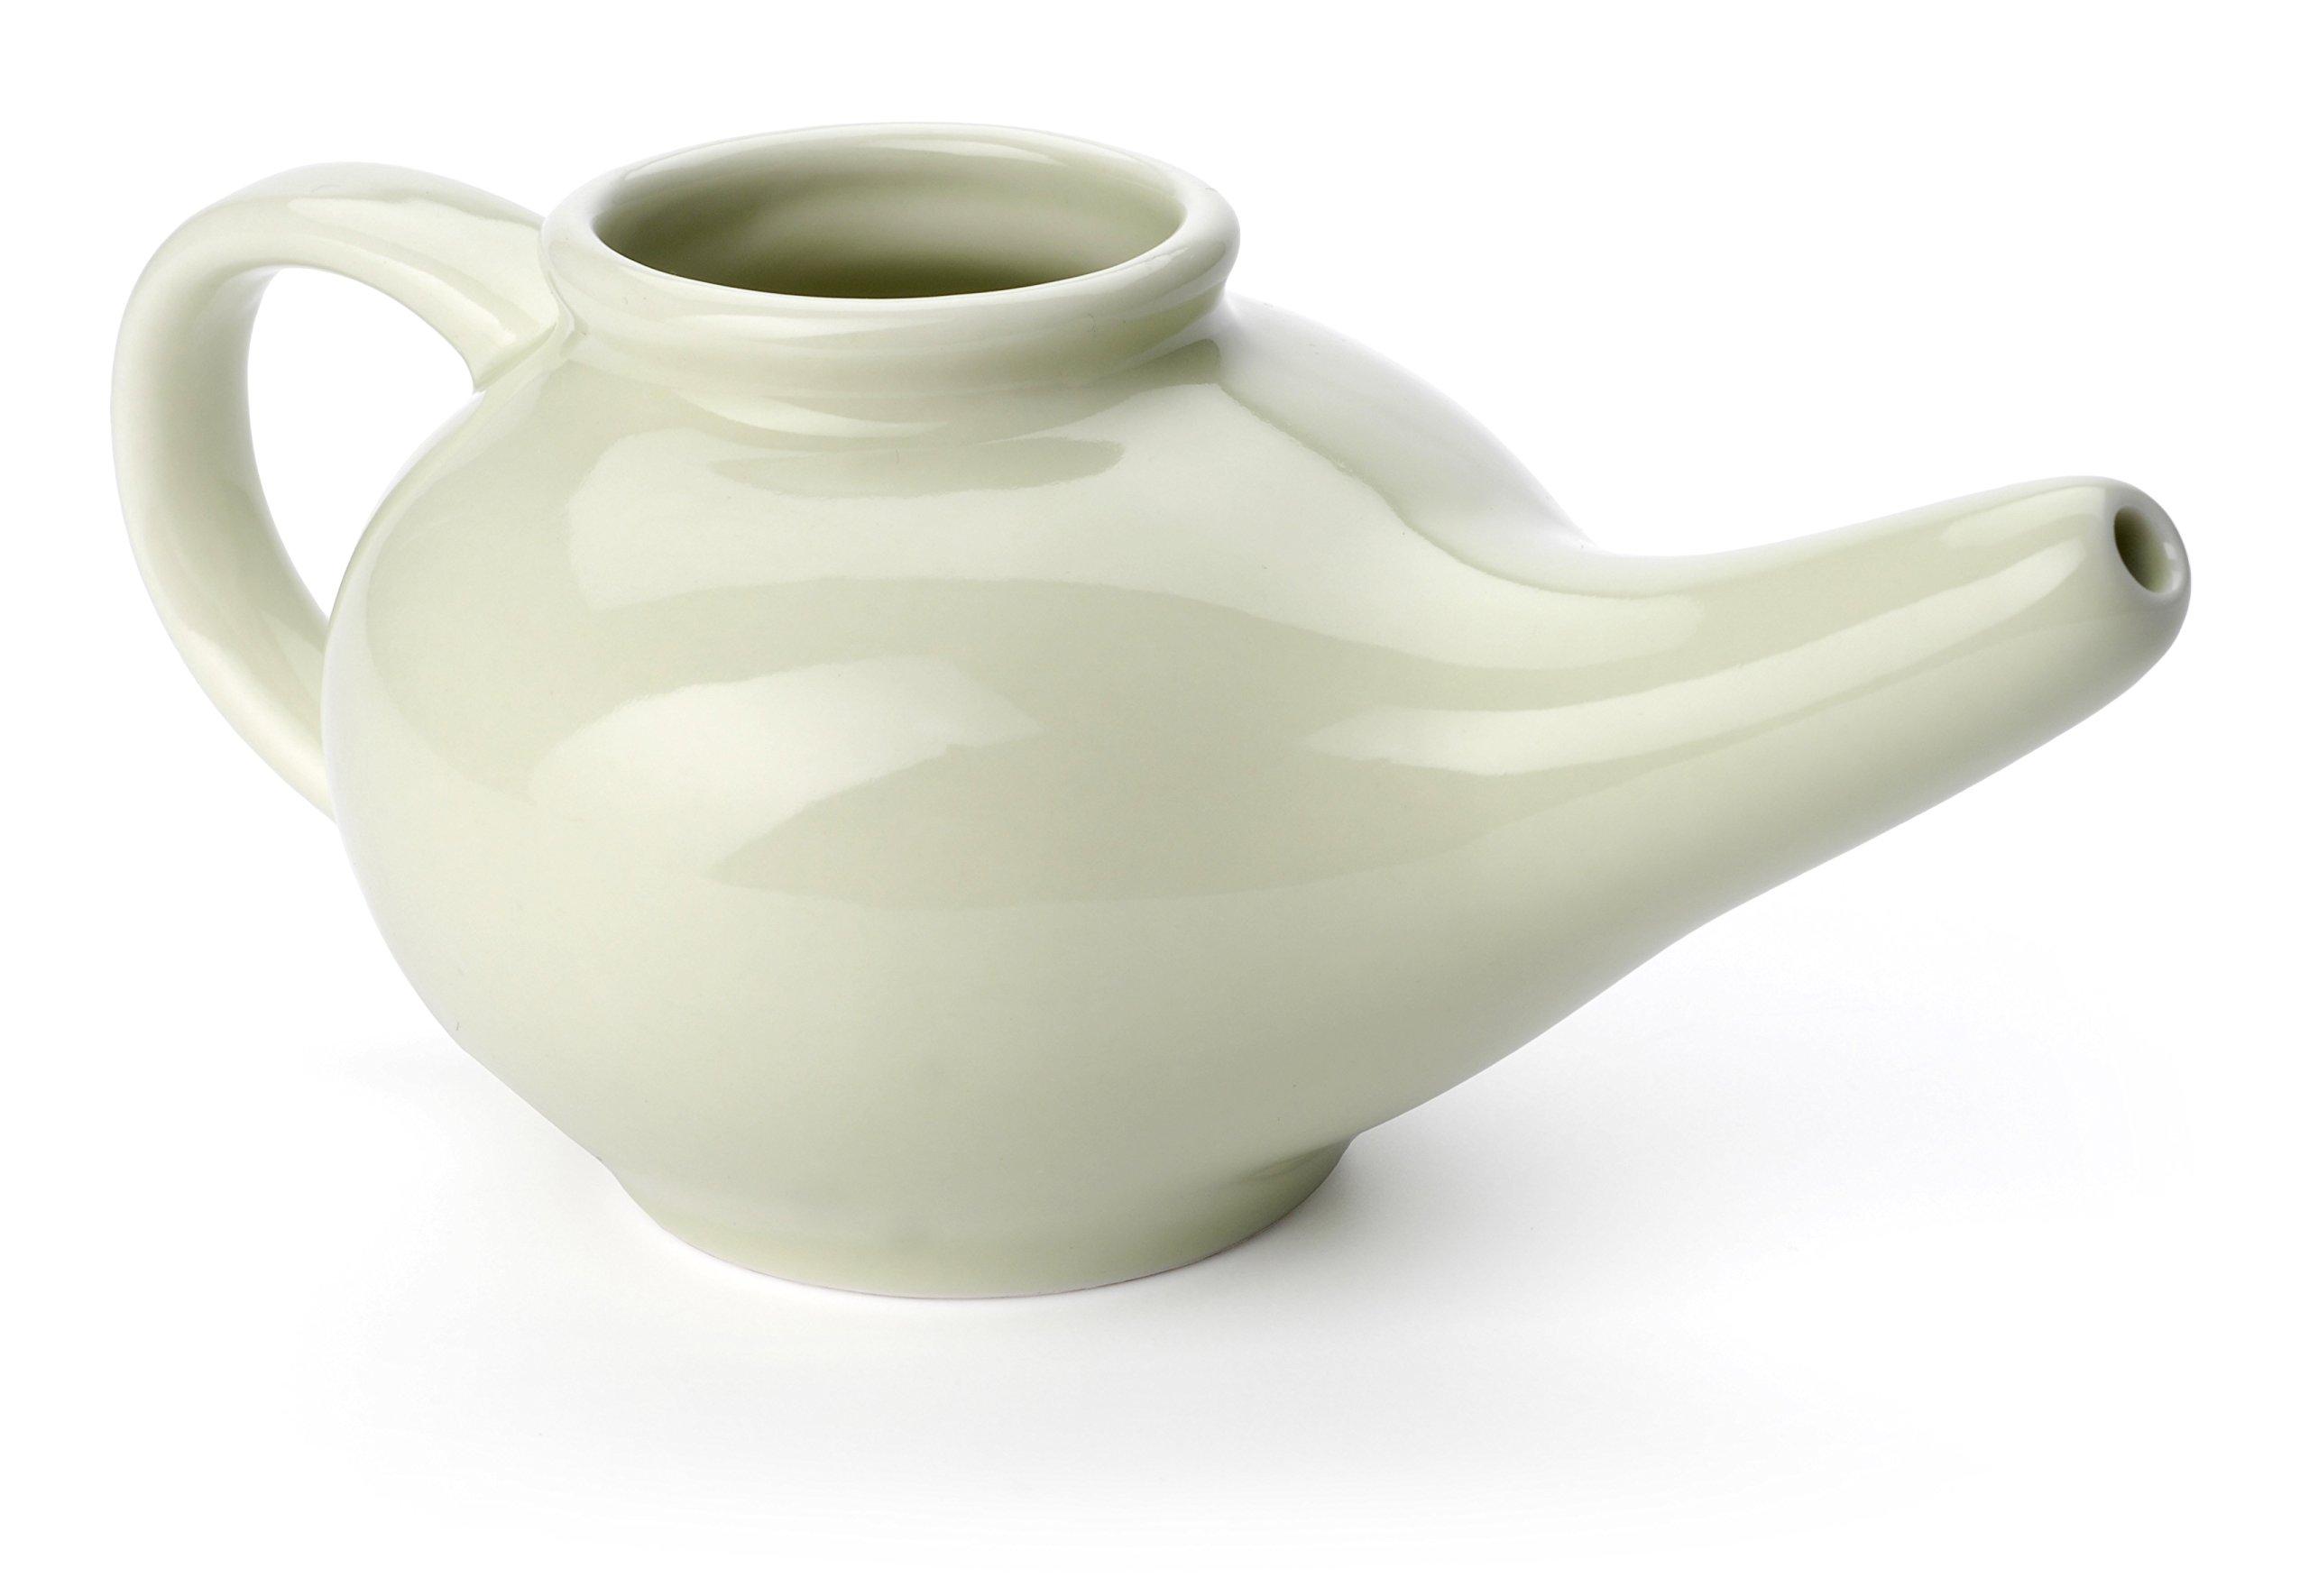 Aromatic Salt Premium Ceramic Neti Pot, Green by Aromatic Salt